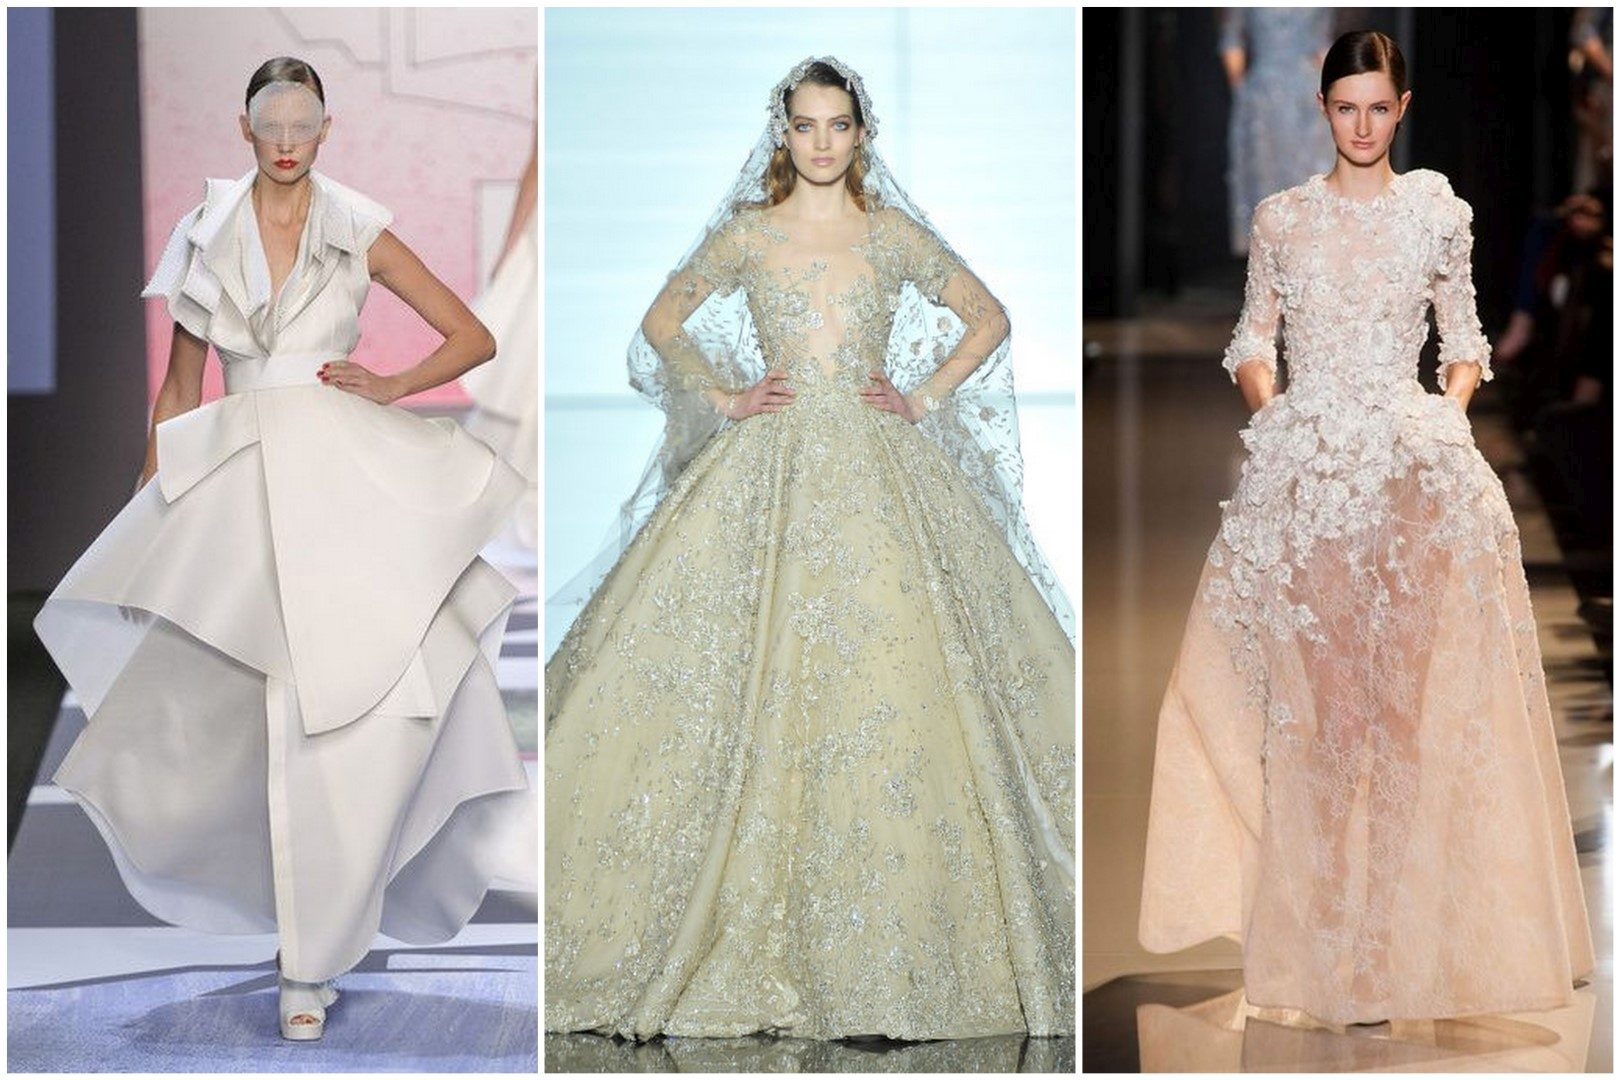 ,esküvői ruha,haute couture,haute couture esküvői ruha,esküvő,divattervező,